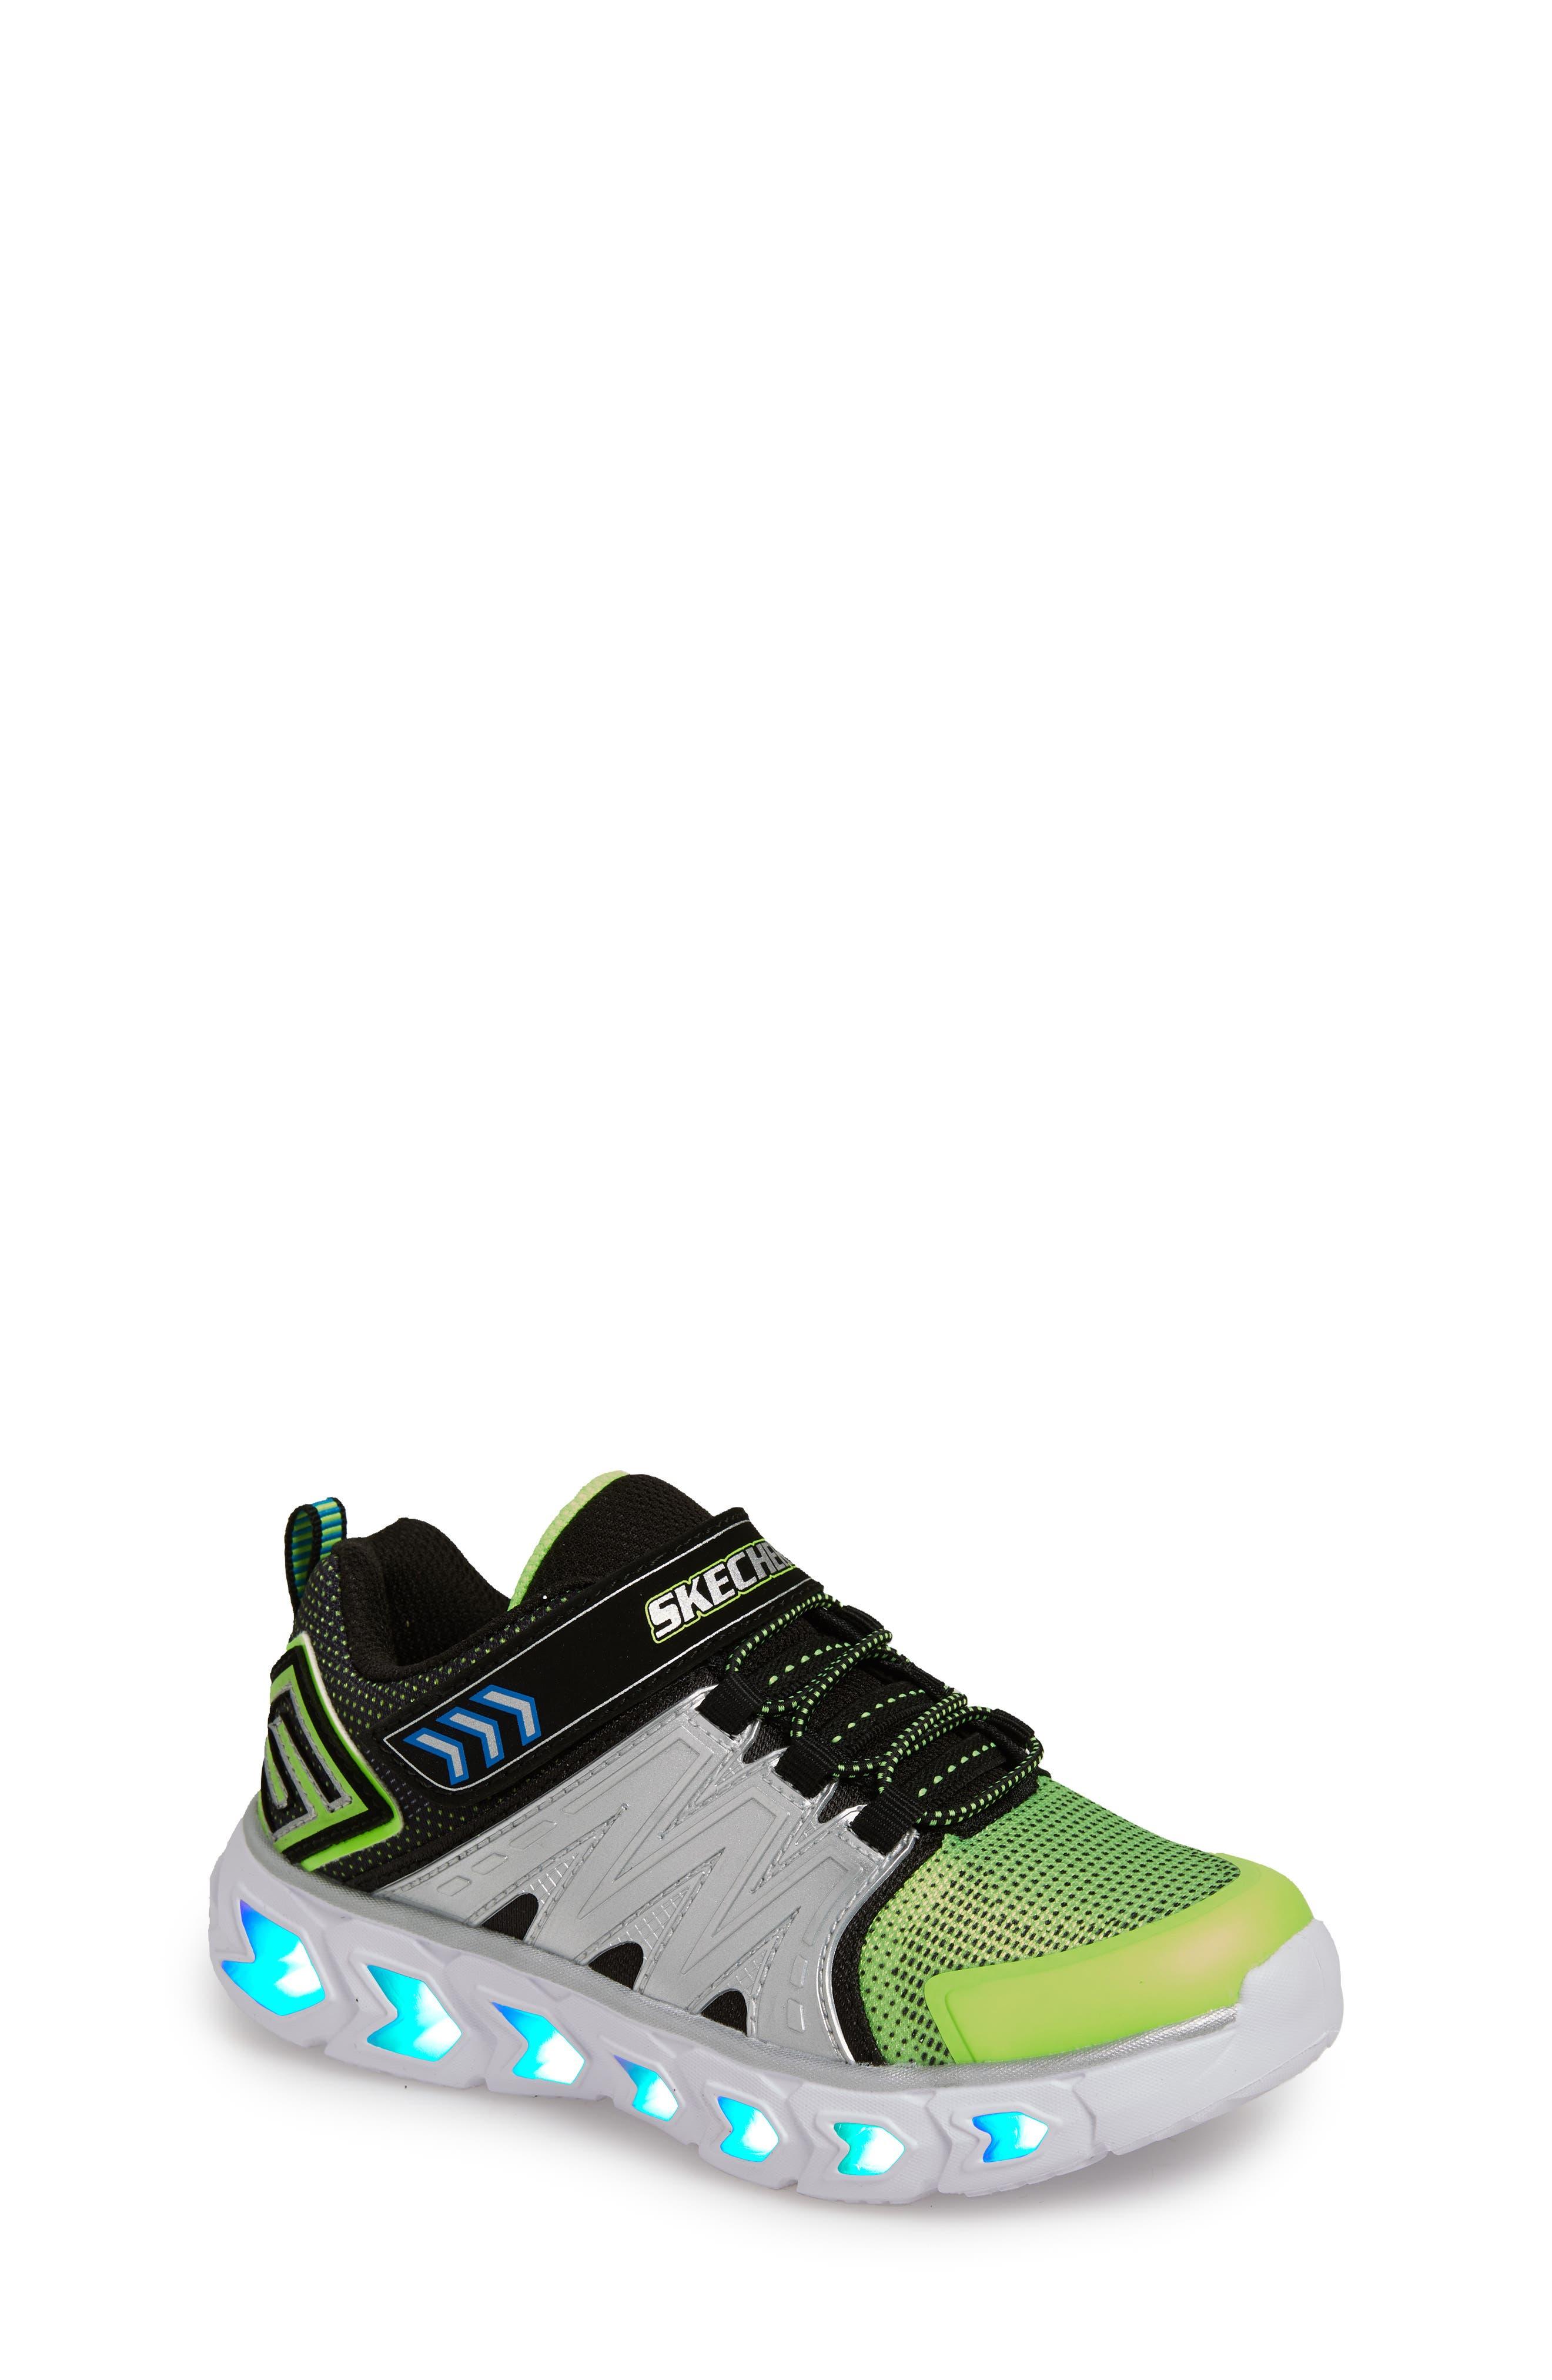 Hypno-Flash 2.0 Sneakers,                             Alternate thumbnail 2, color,                             Lime/ Black